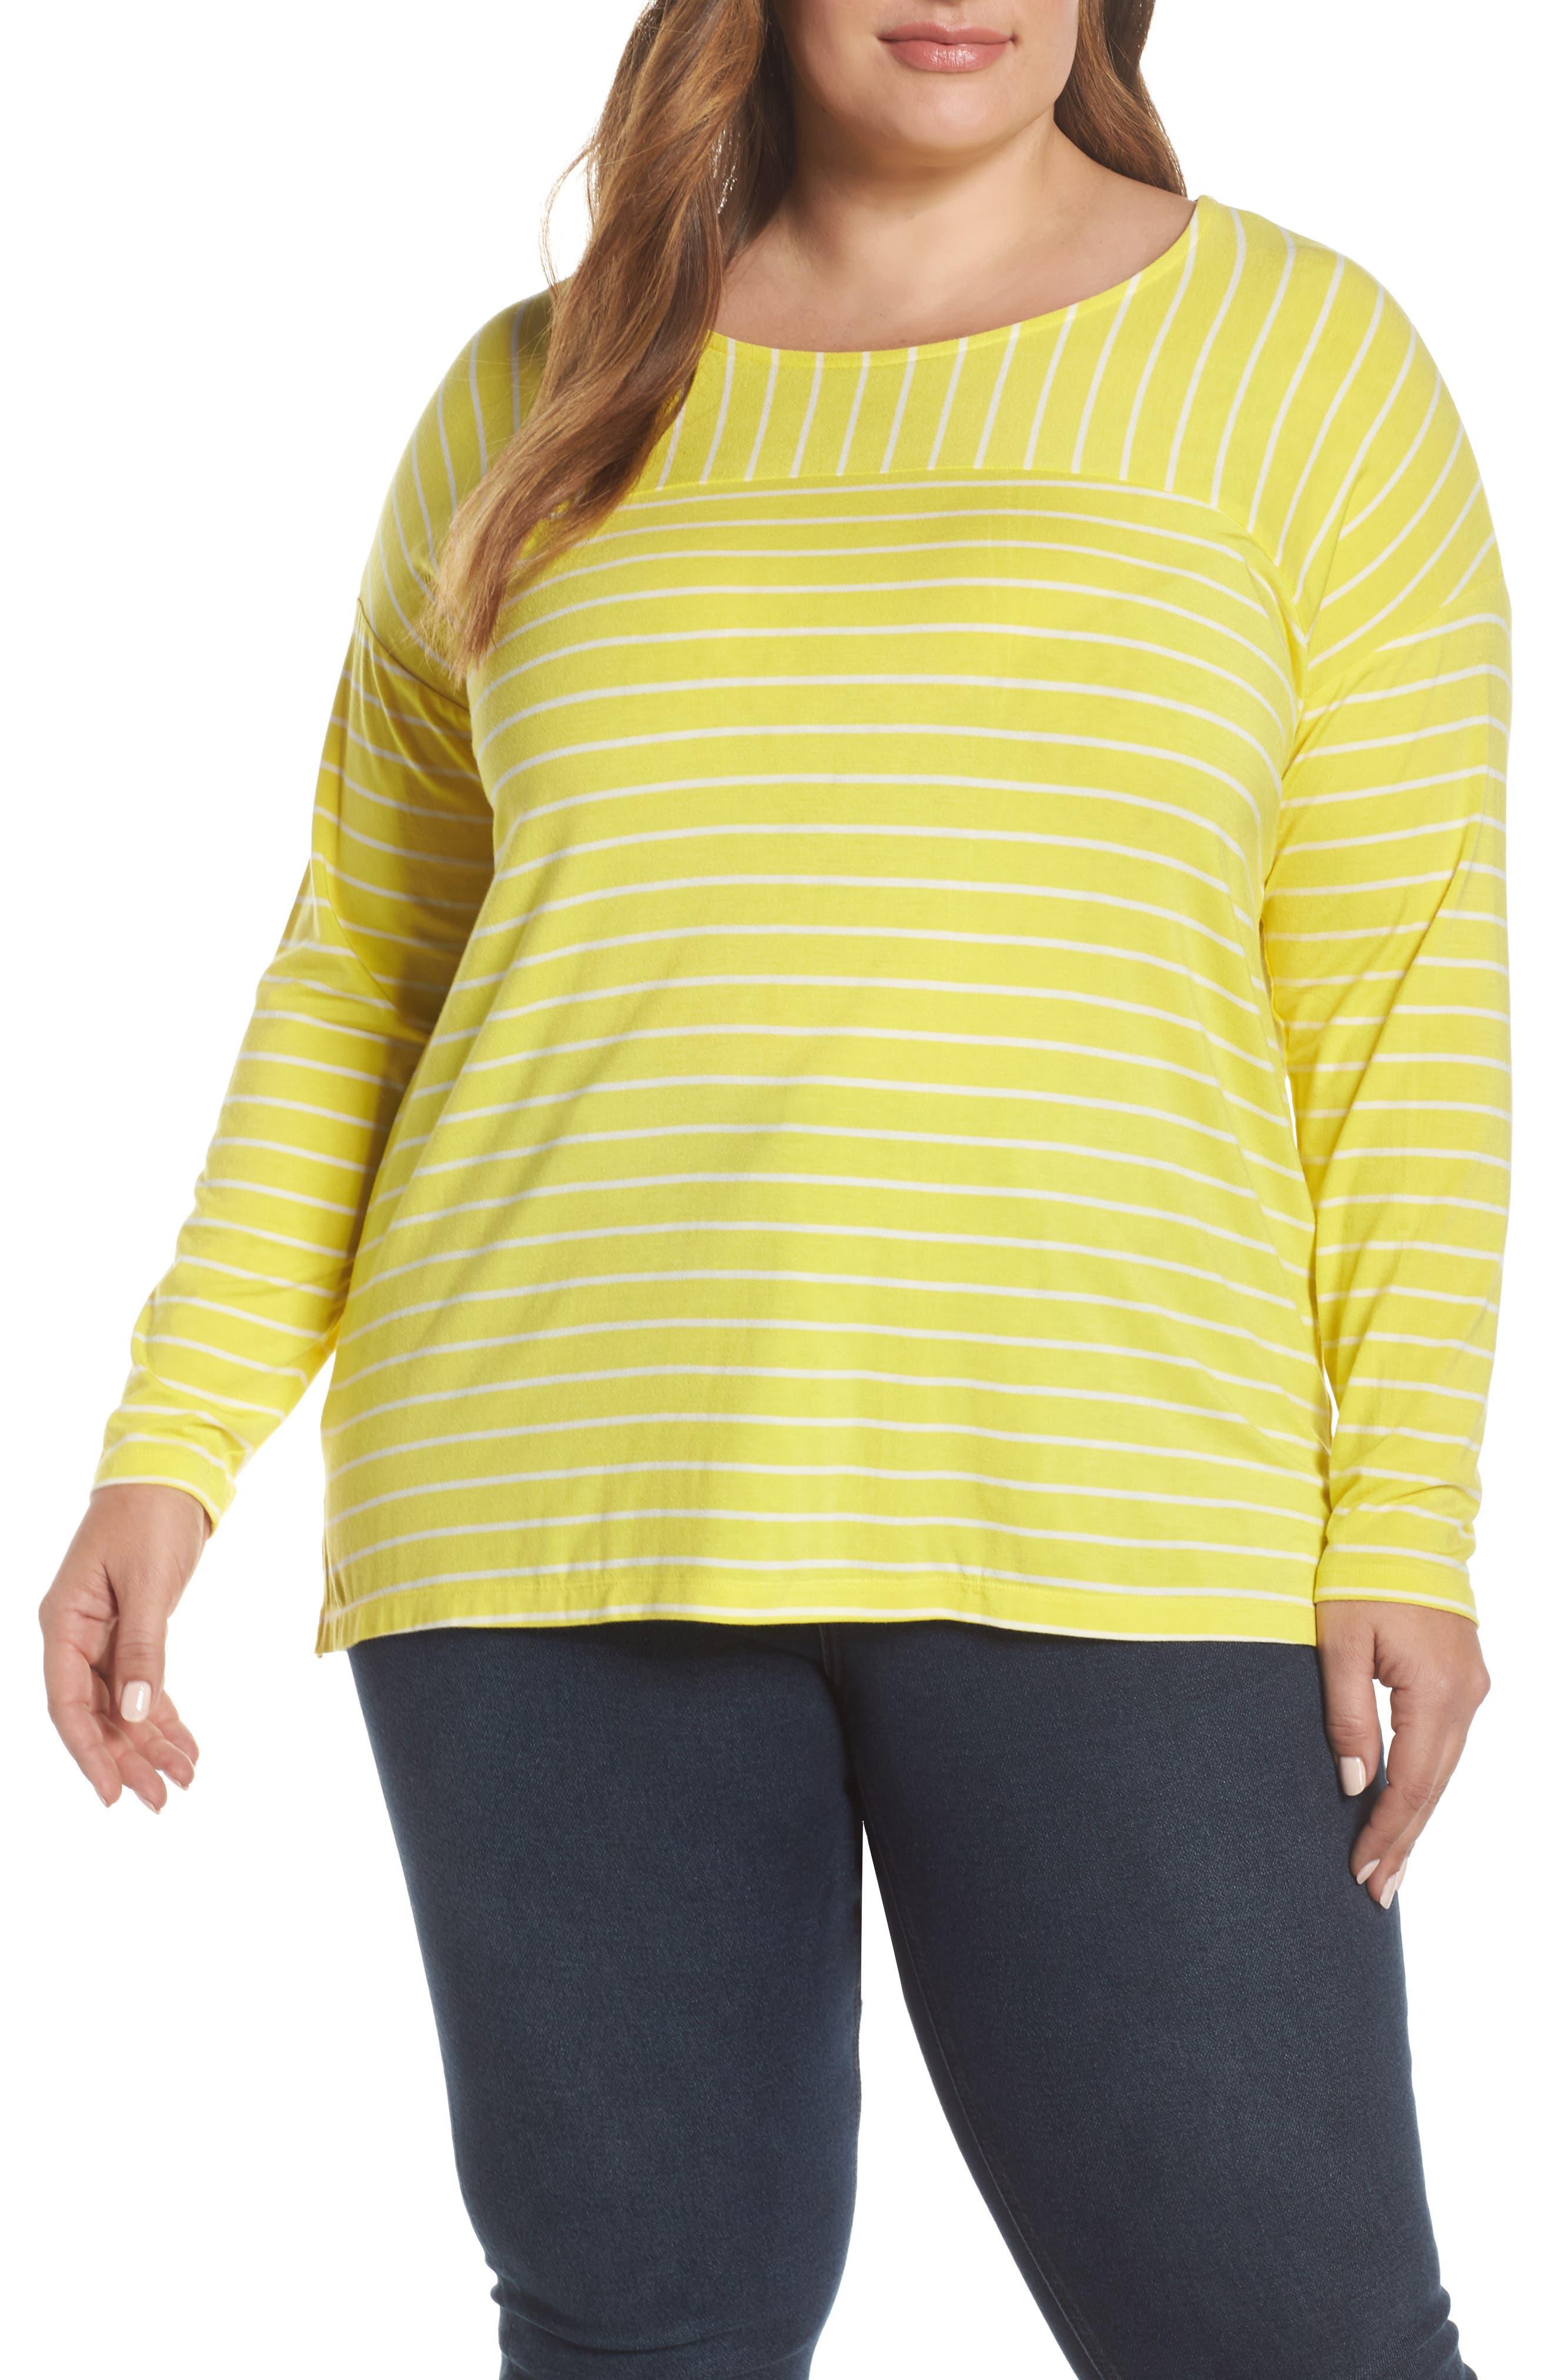 SEJOUR Stripe Long Sleeve Tee, Main, color, YELLOW ANYA STRIPE